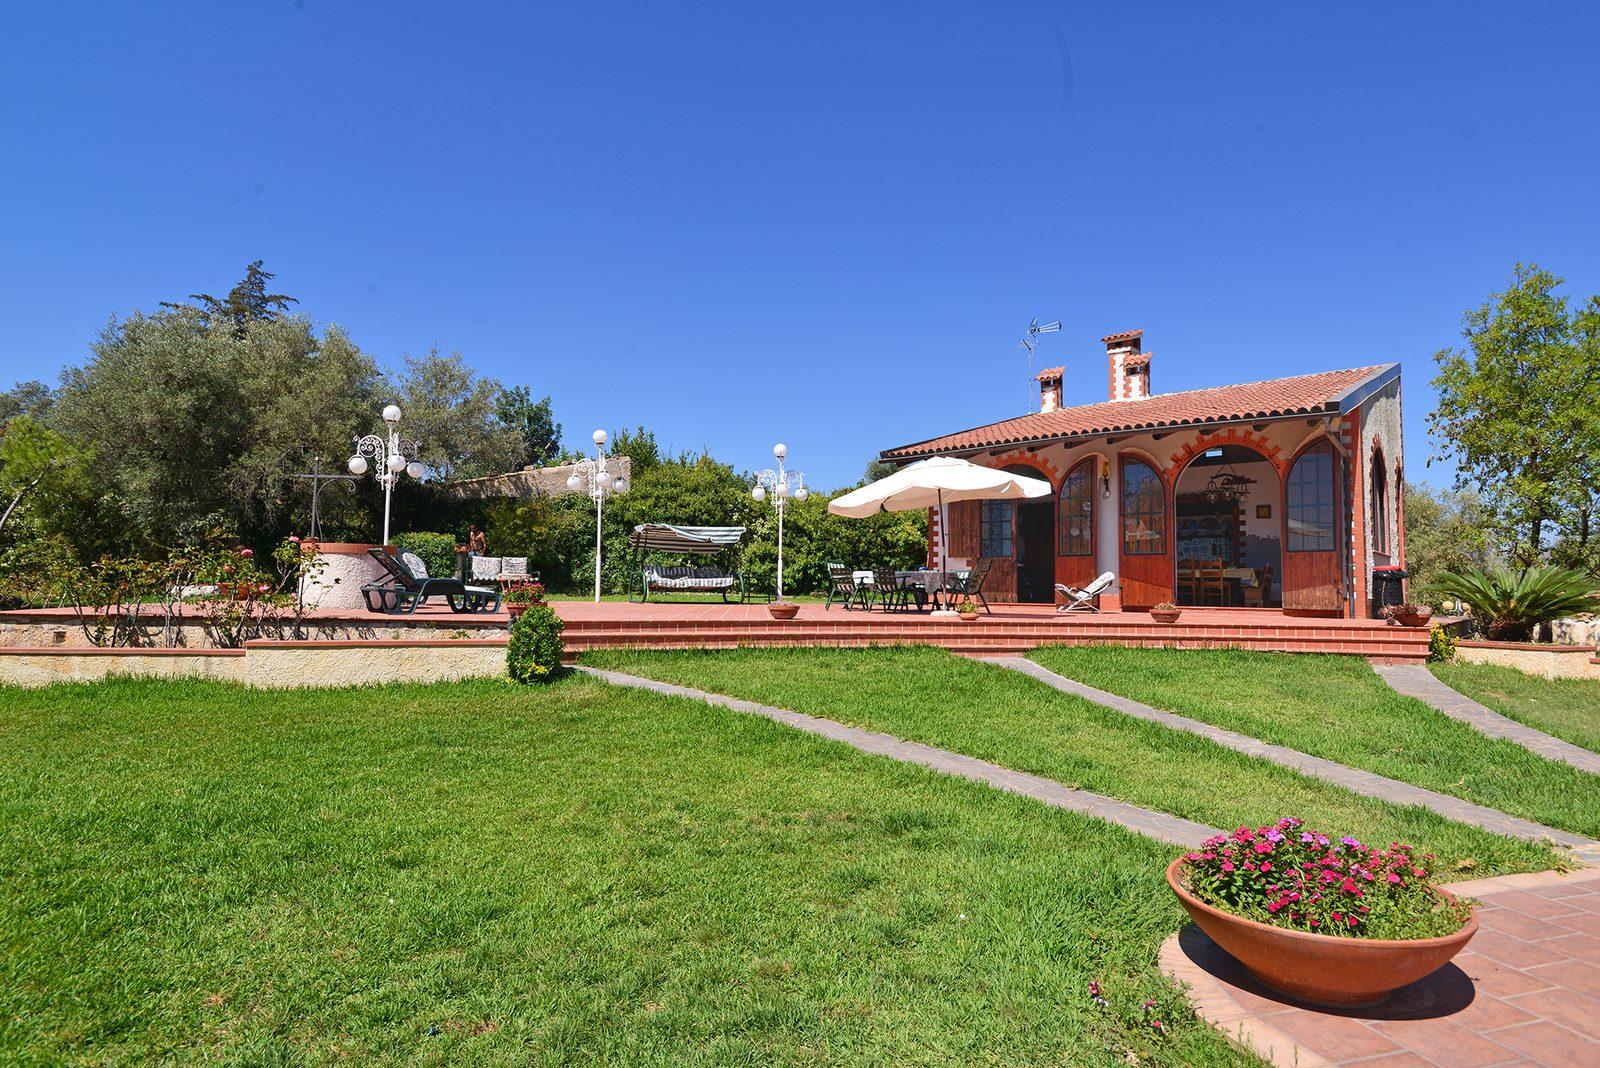 Maison de vacances Villa Casa (1531407), Solarino, Siracusa, Sicile, Italie, image 16